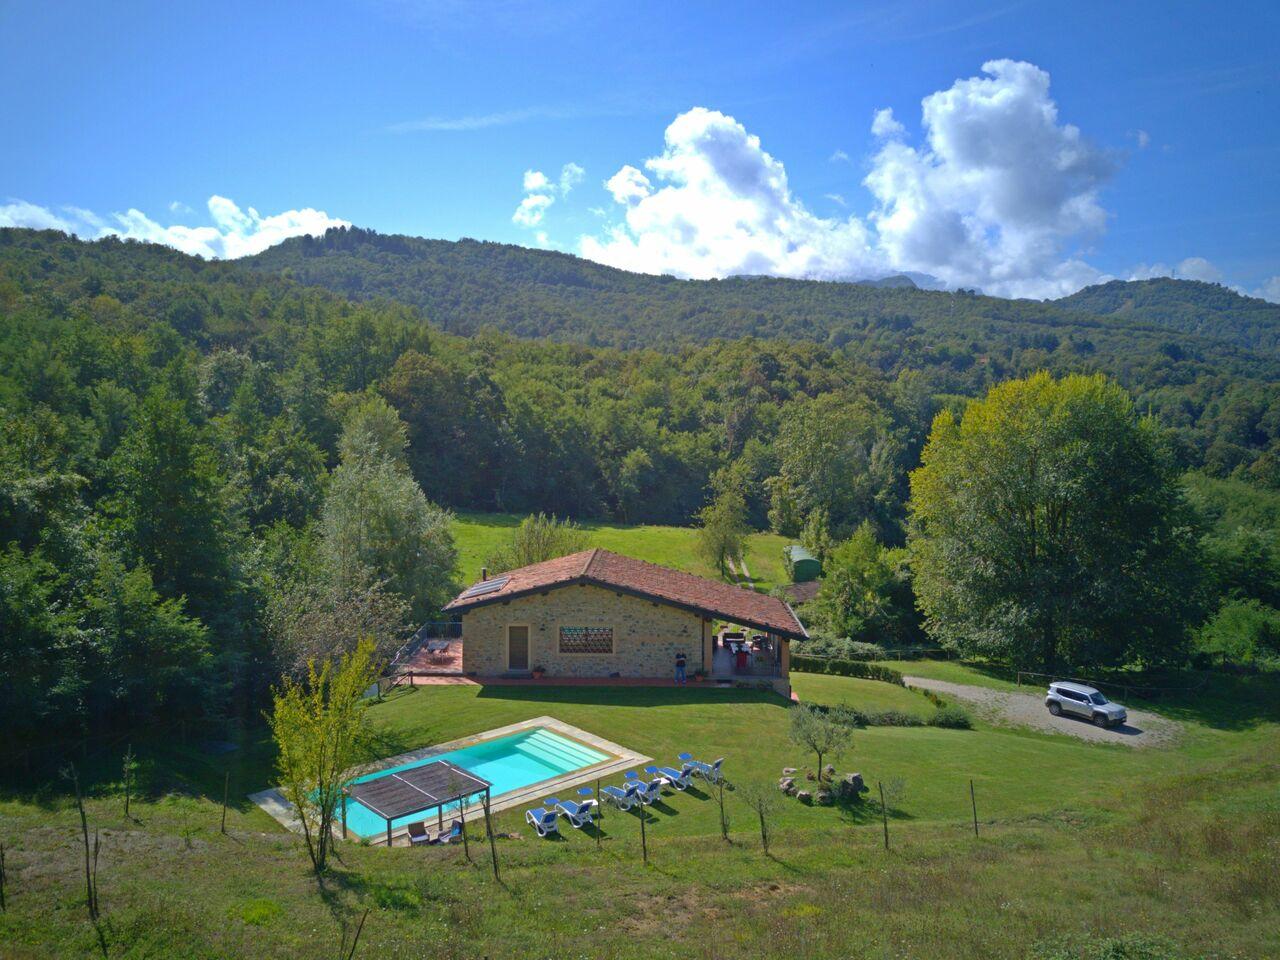 Villa with pool in Garfagnana